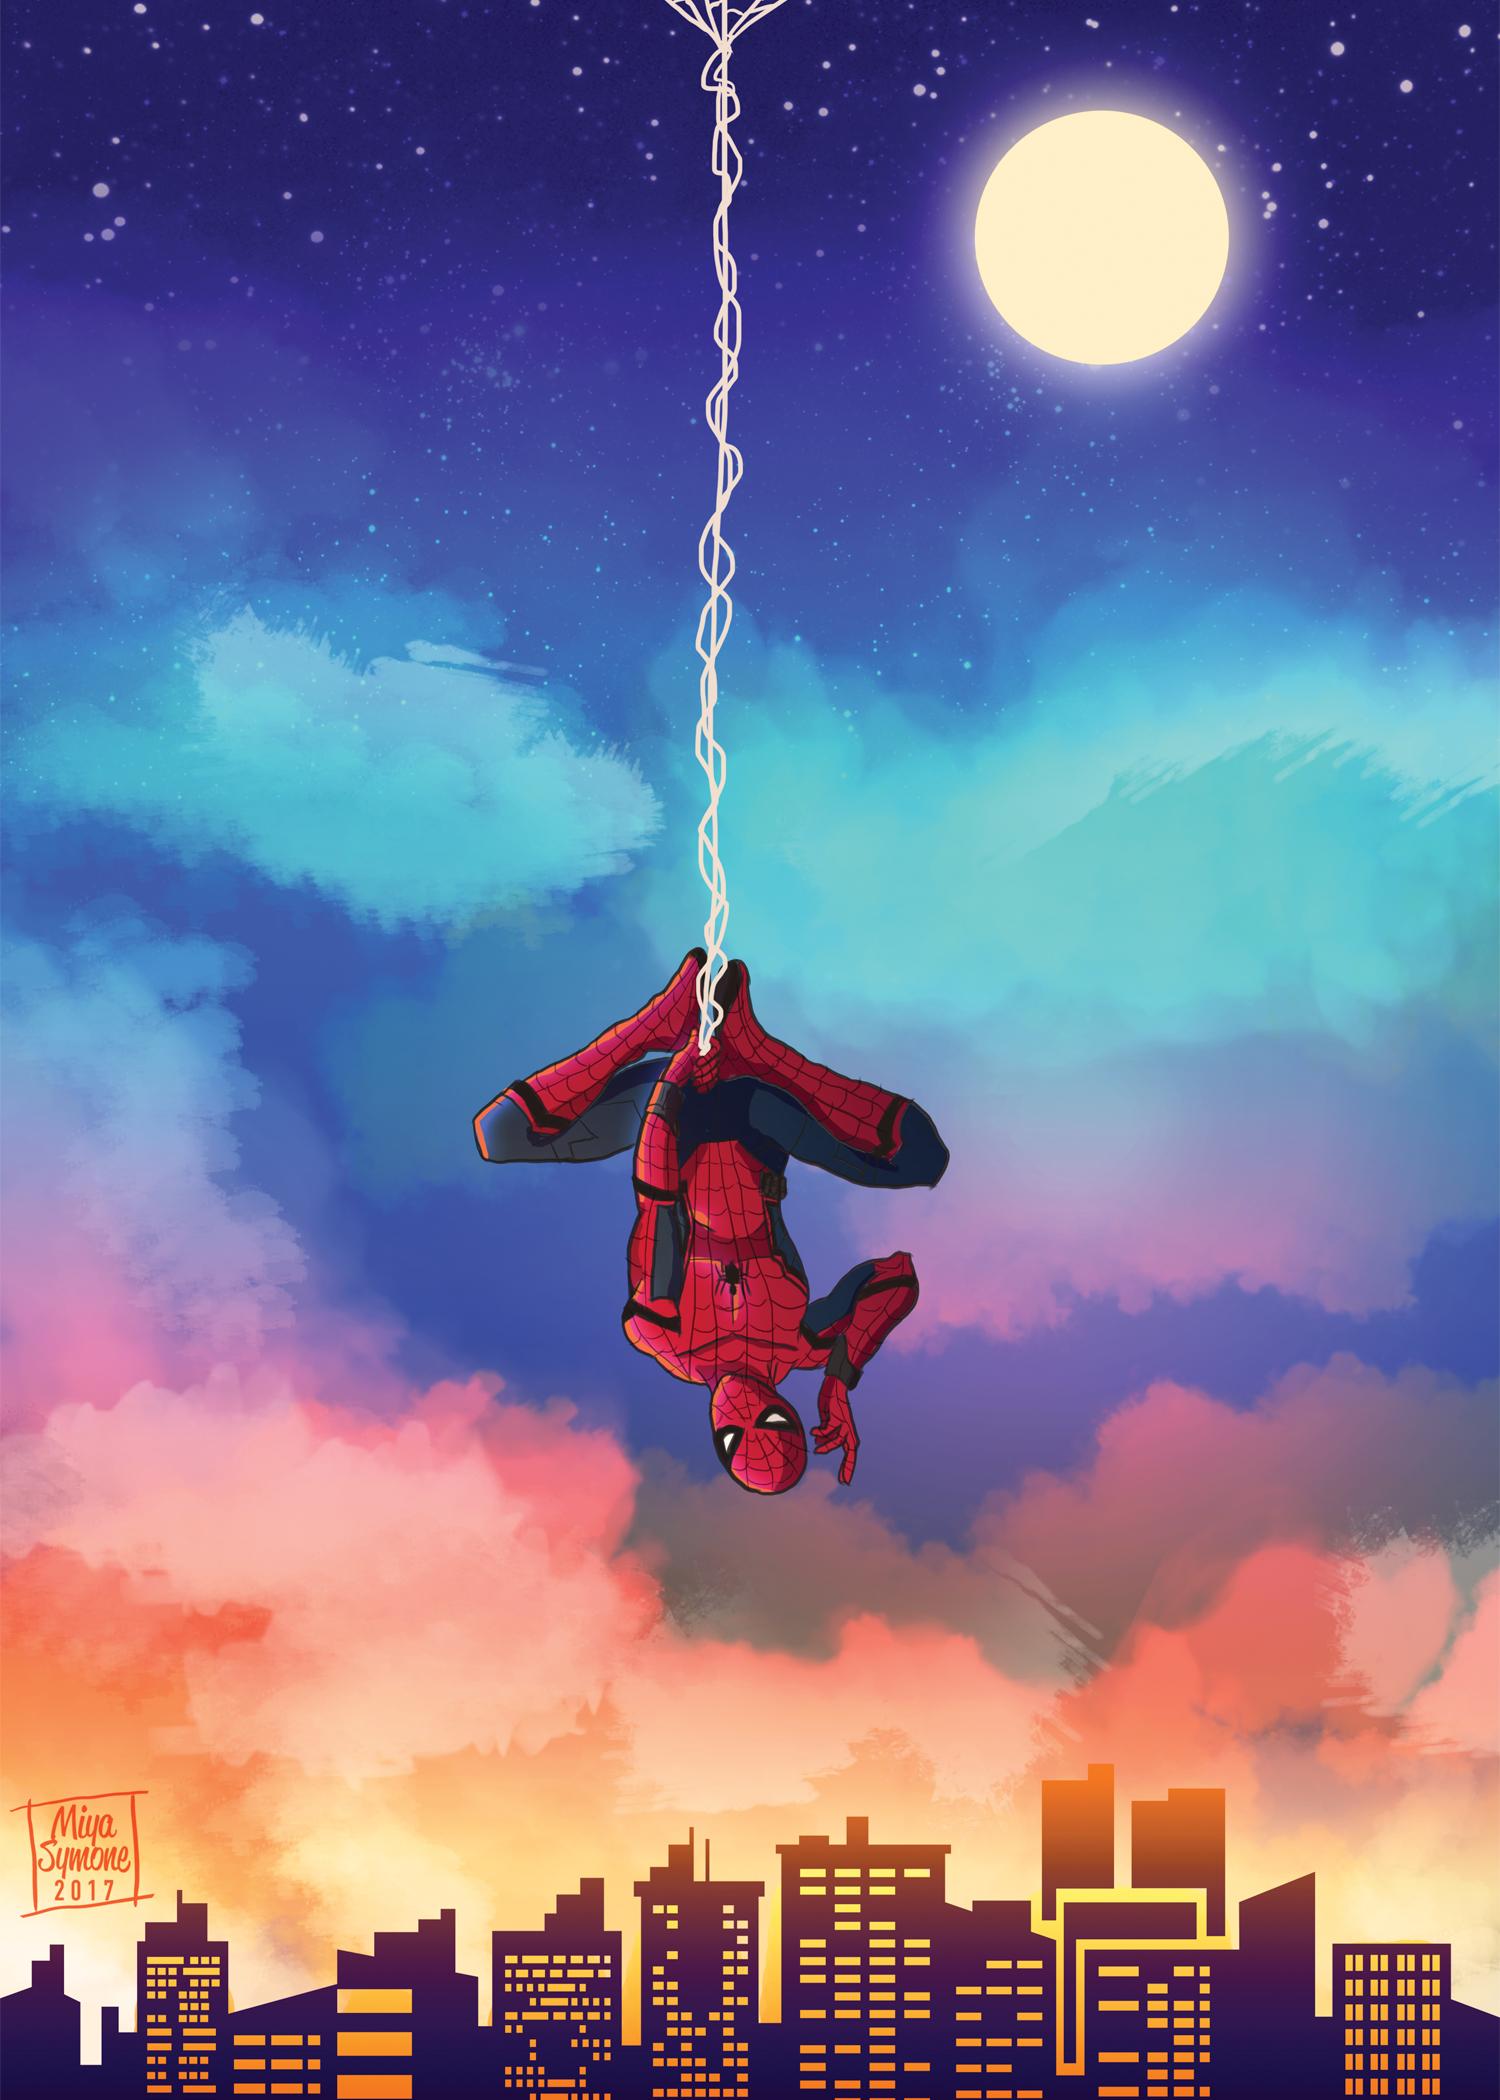 Spiderman-small.jpg